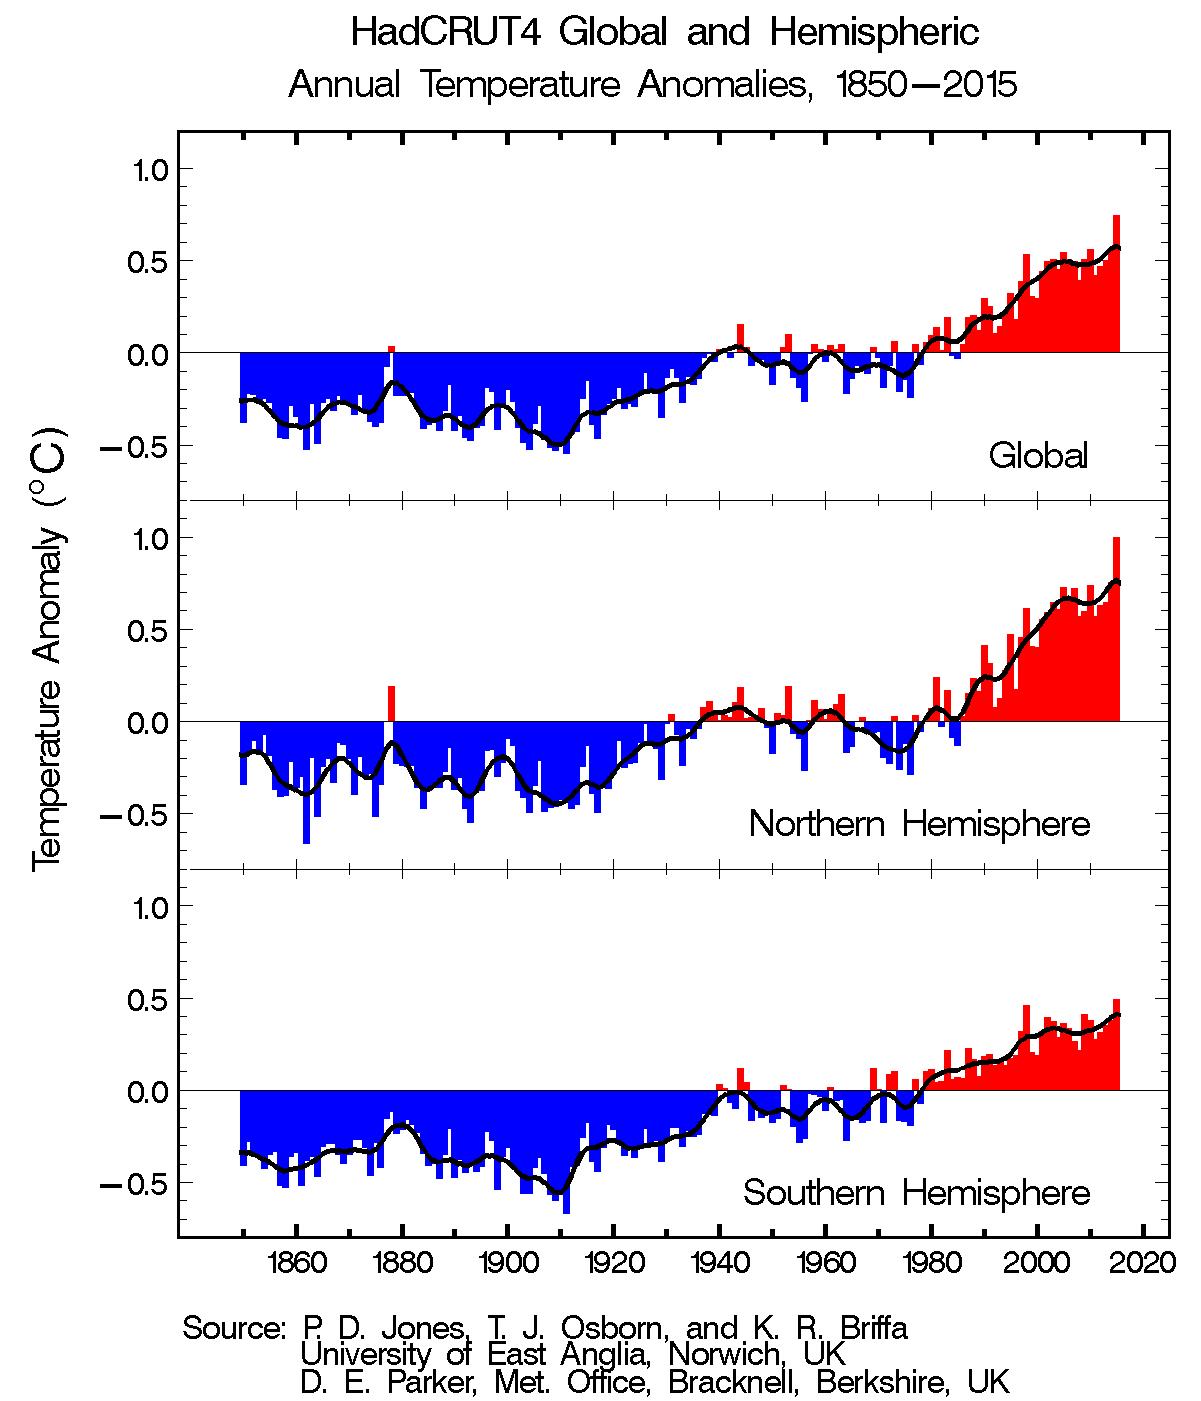 TRENDS: Global and Hemispheric Temperature Anomalies